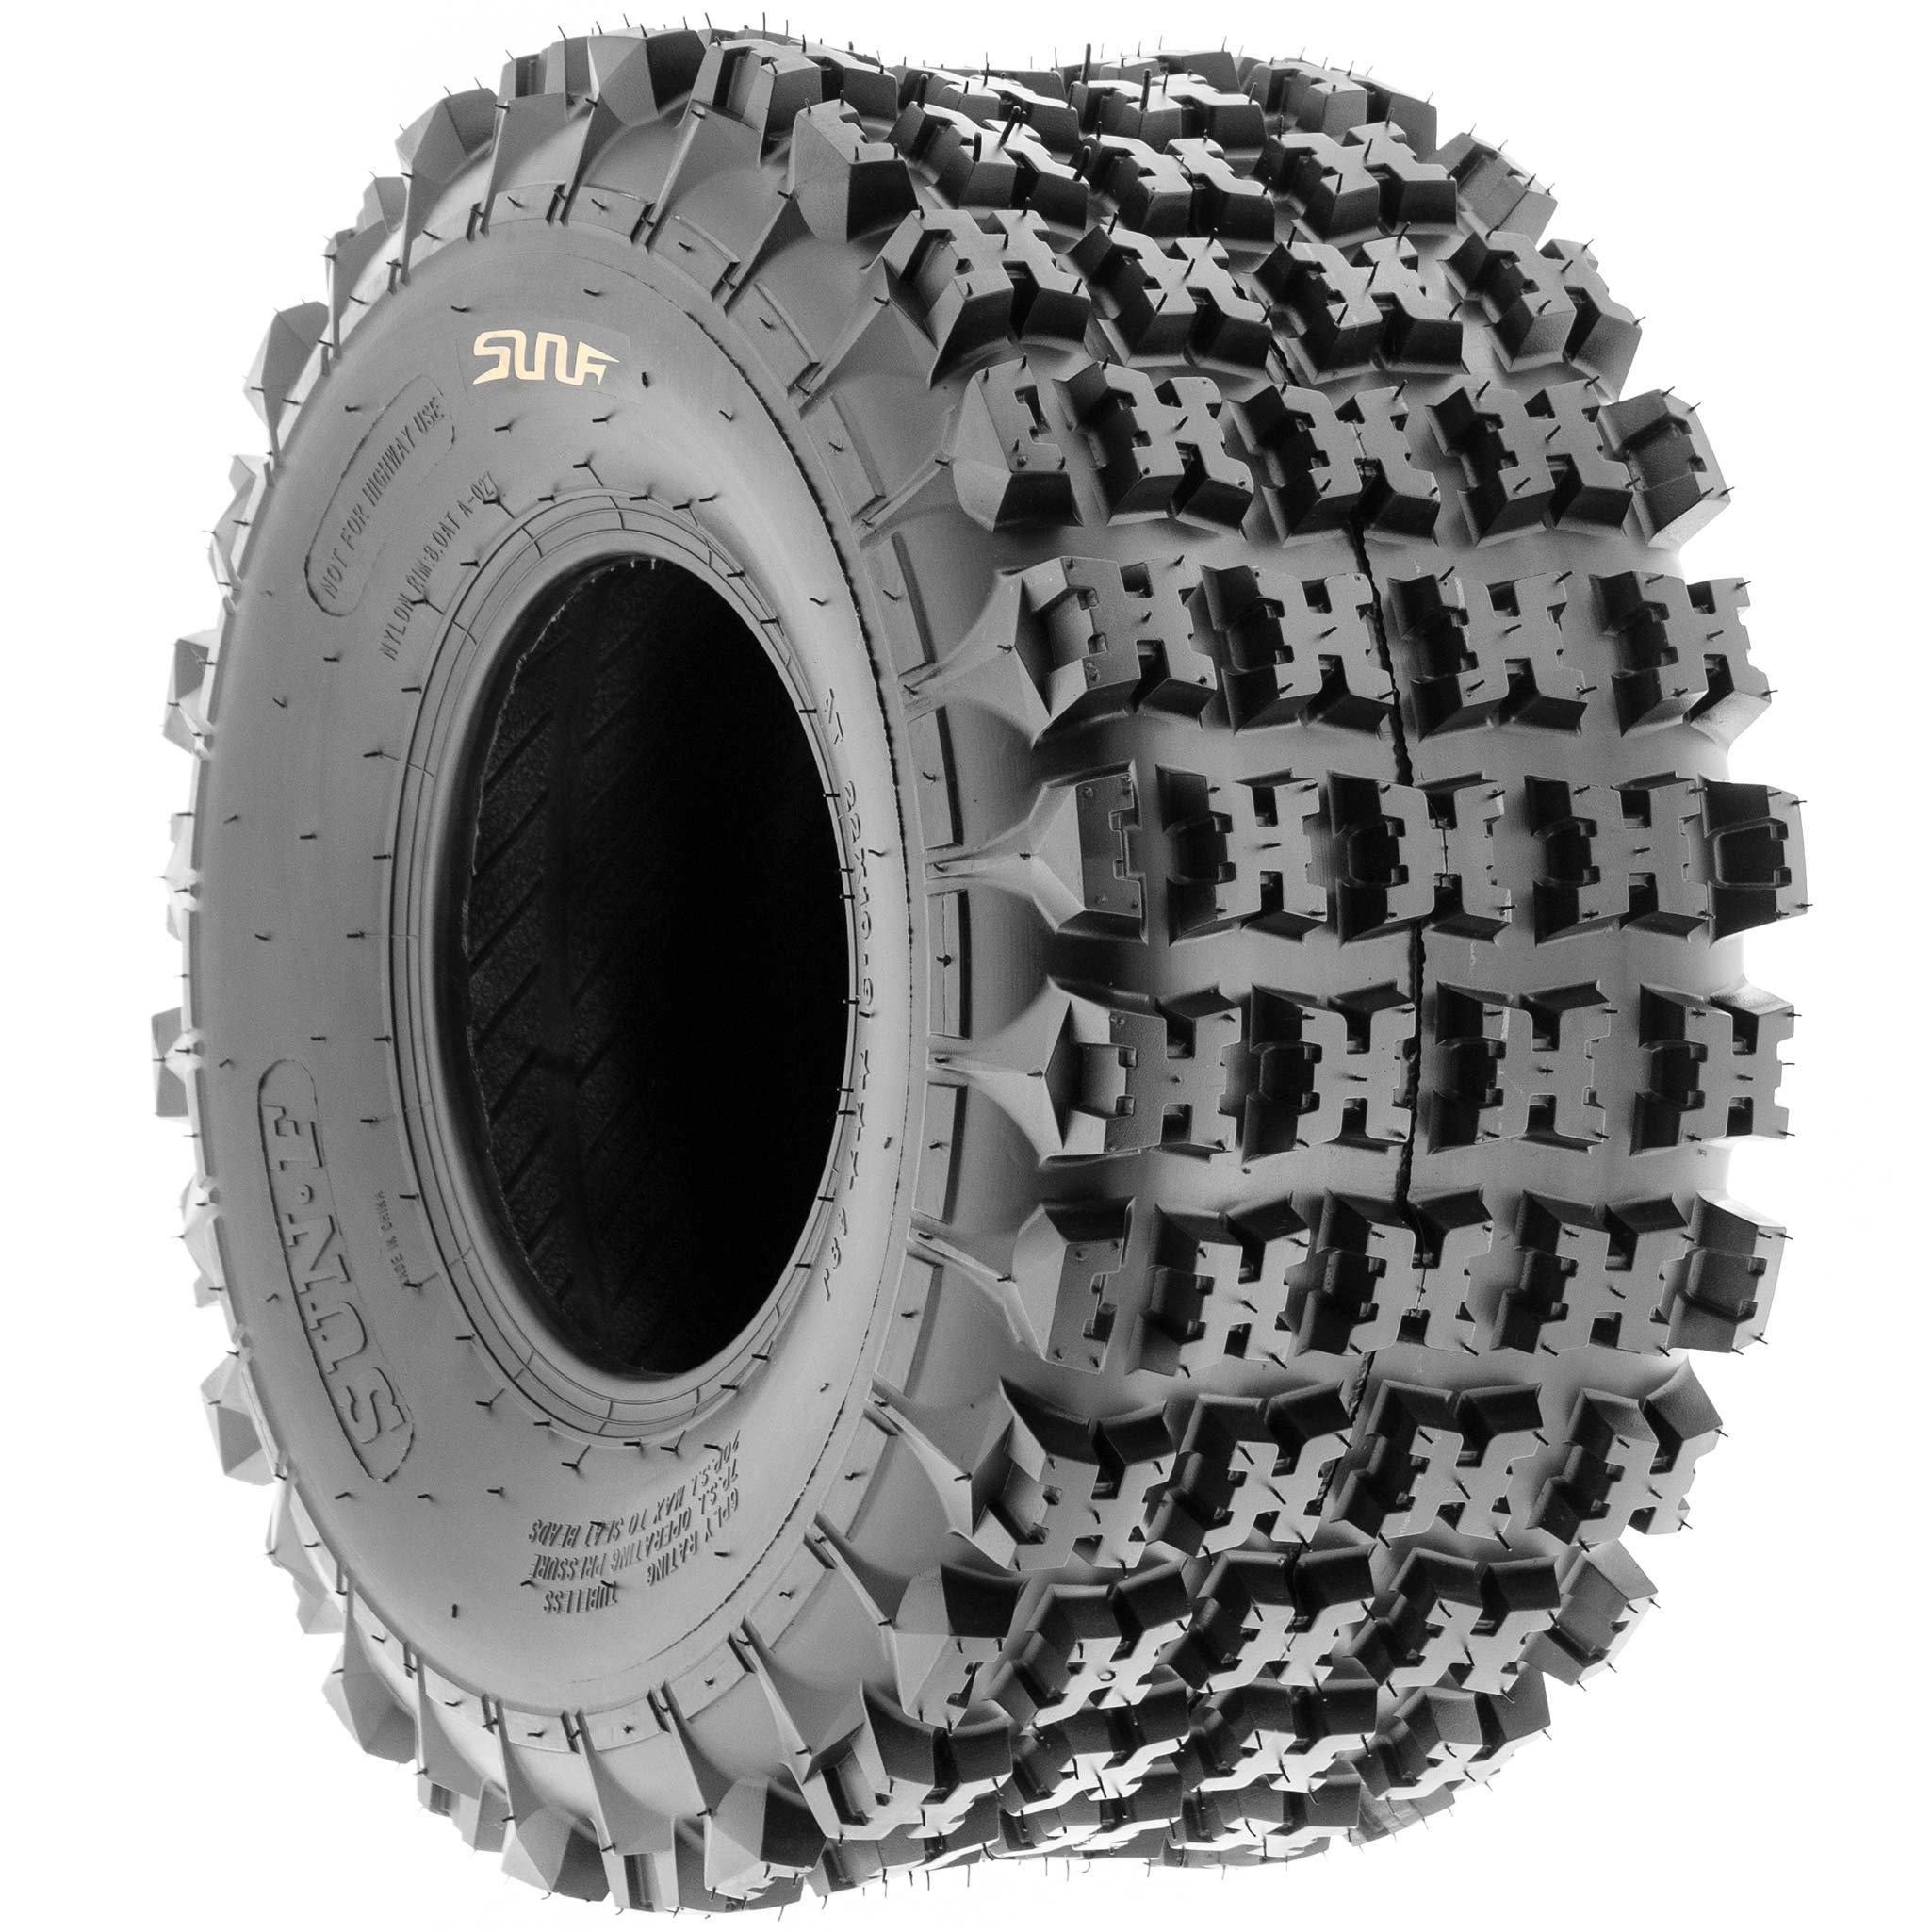 SunF 18x10.5-8 18x10.5x8 ATV UTV All Terrain Race Replacement 6 PR Tubeless Tires A027, [Set of 2] by SunF (Image #5)